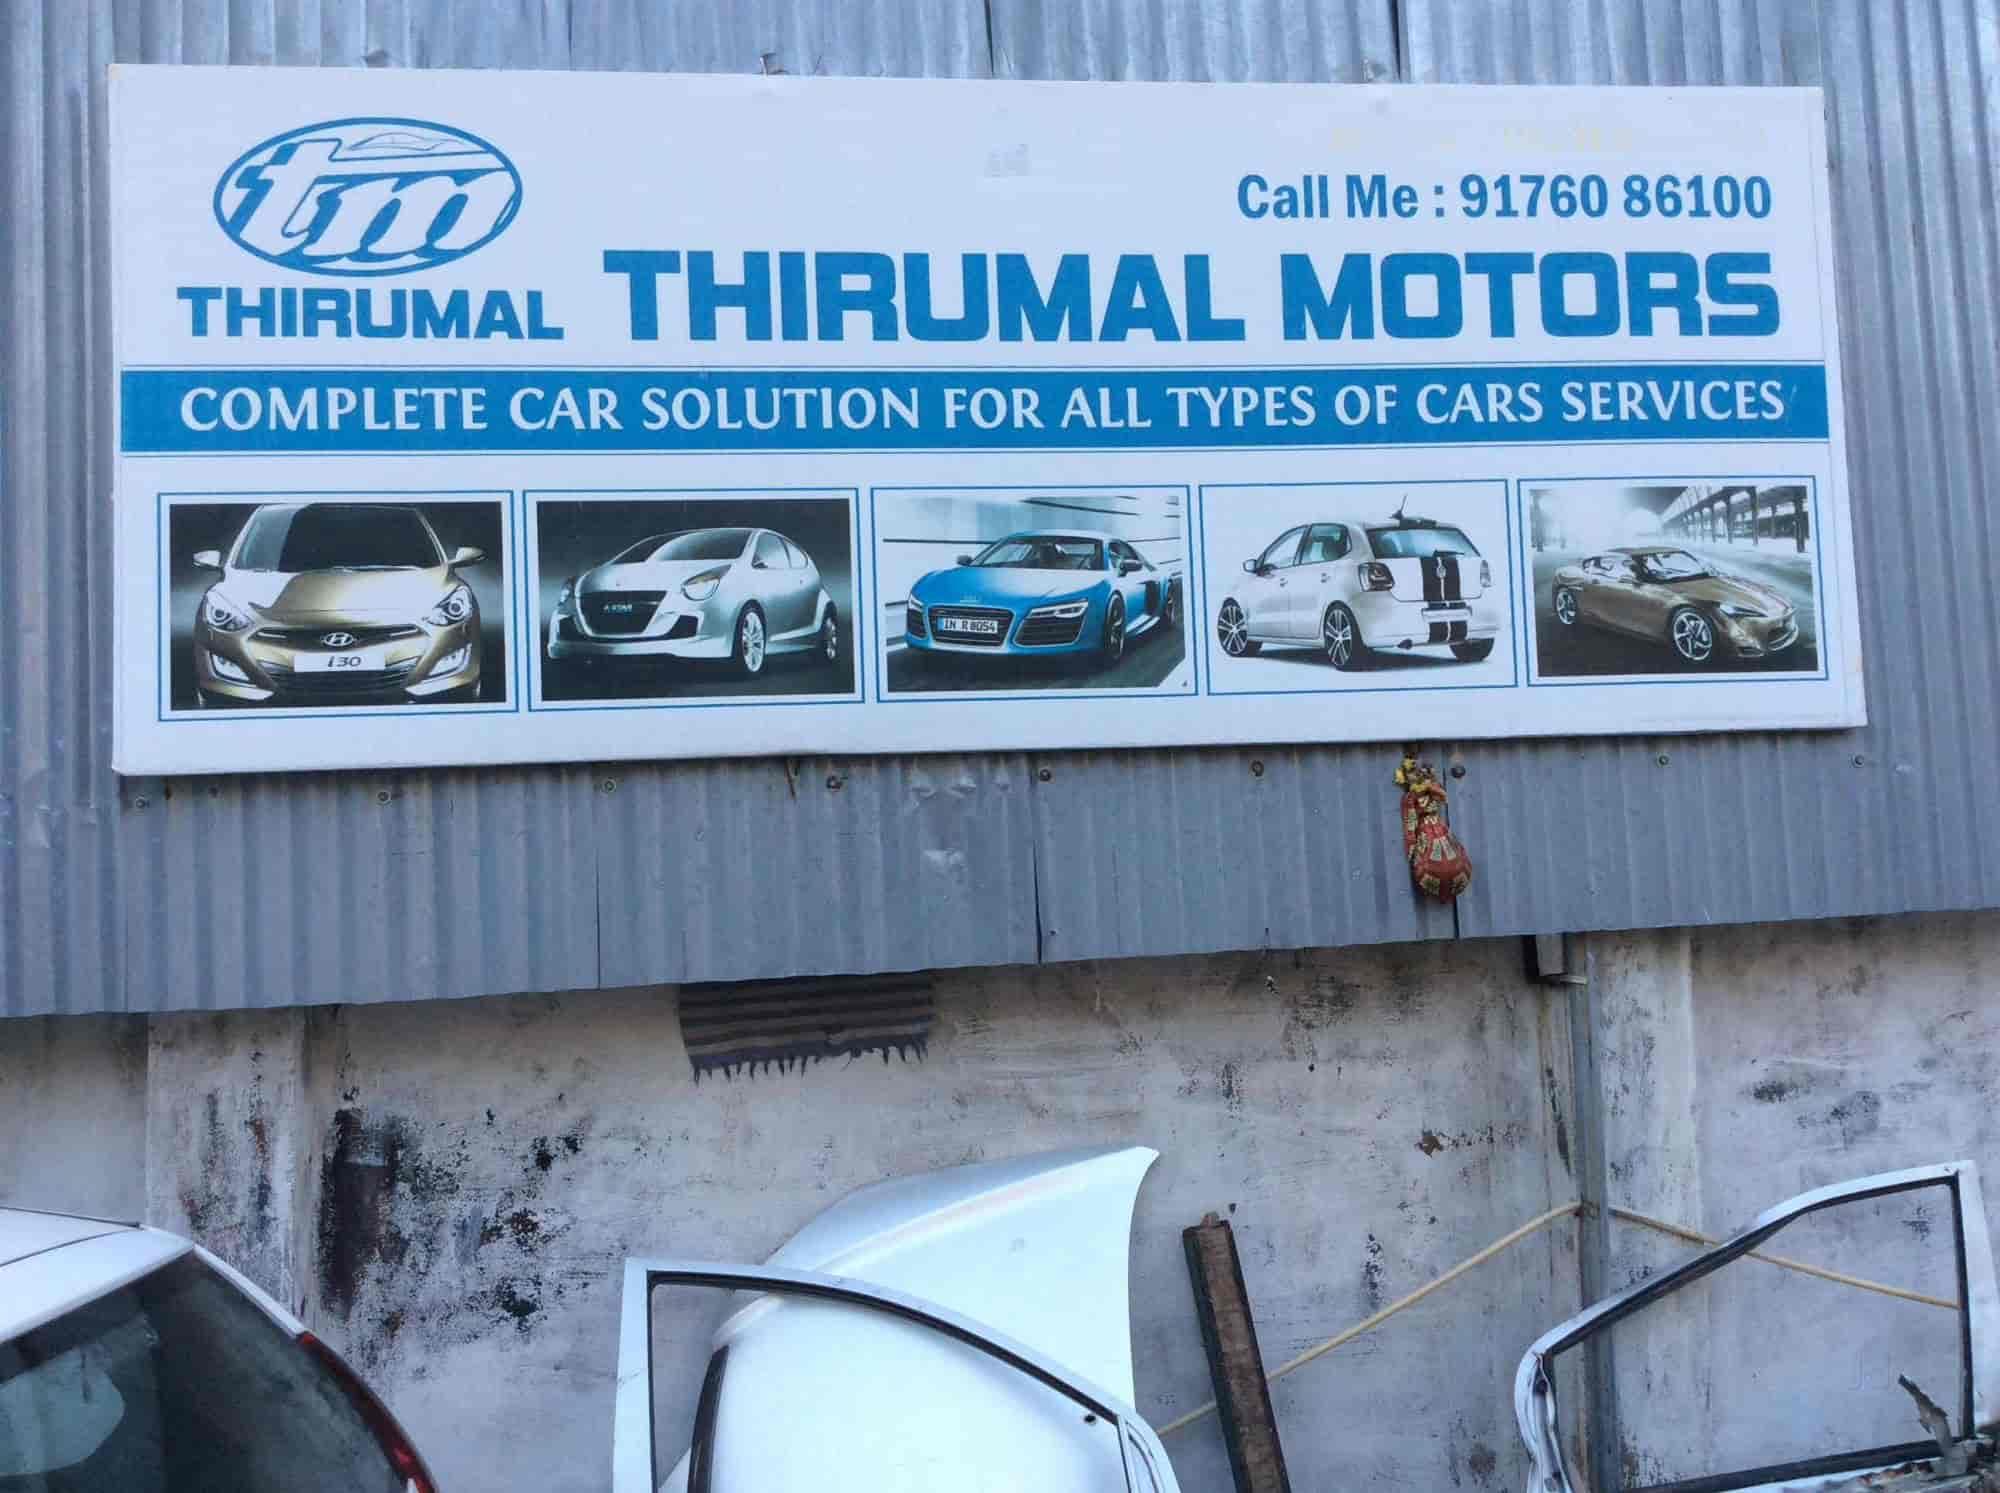 Thirumal Motors Multibrand Car Service Centre Photos - Cool cars service centre